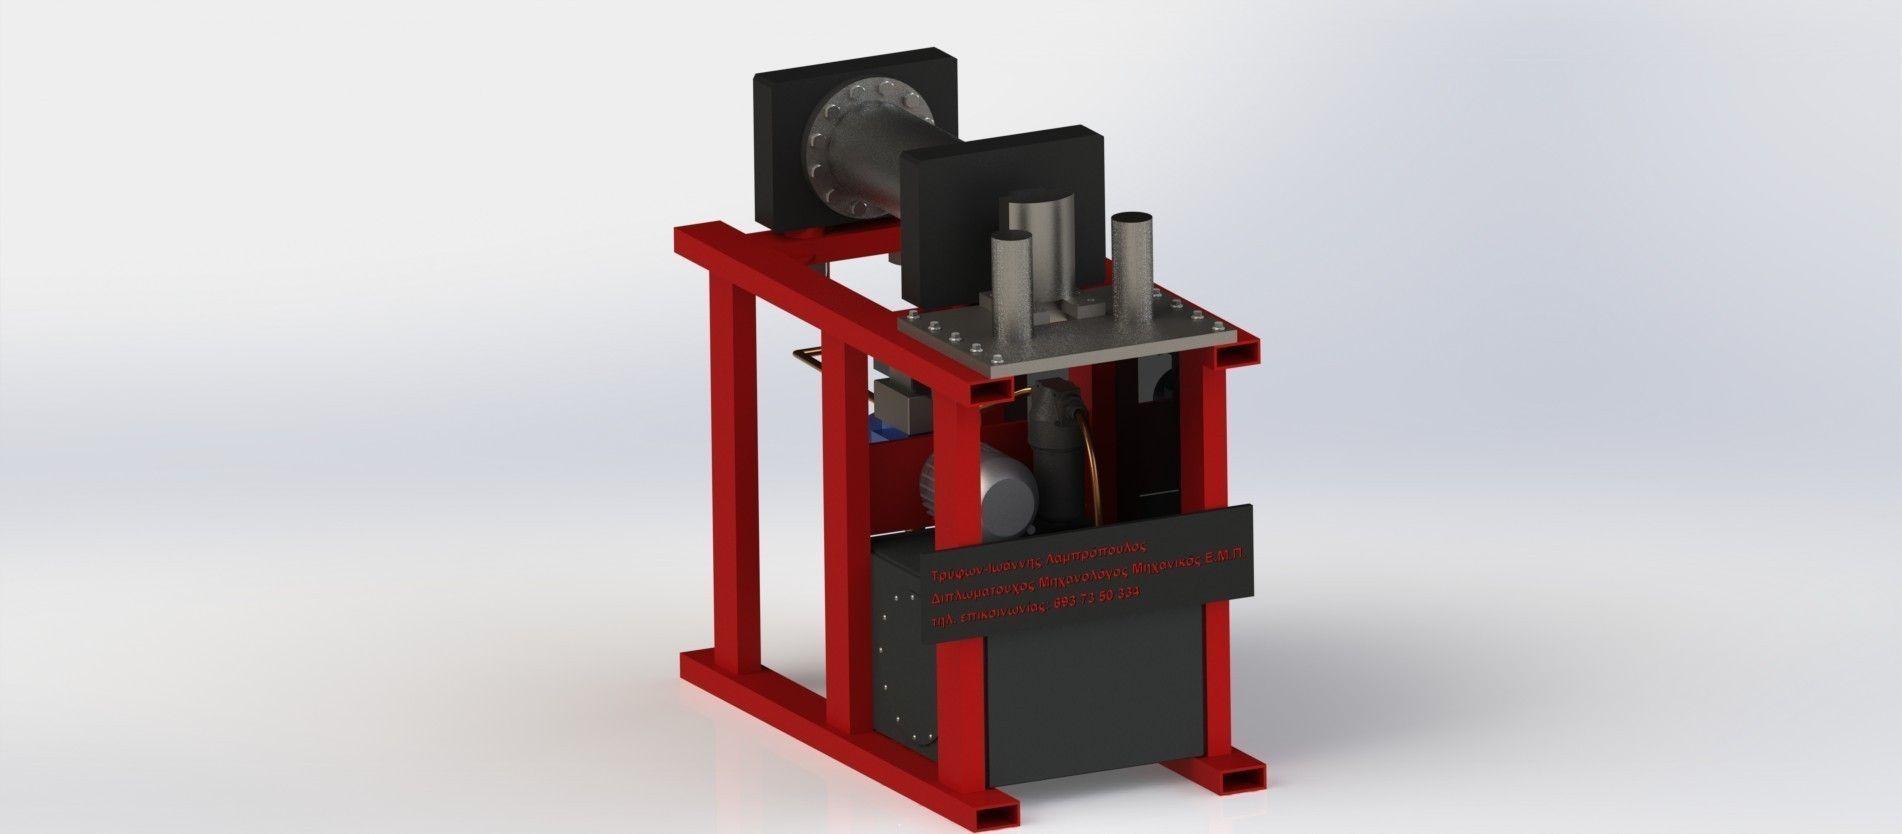 Horizontal Press Brake 3d Model Cgtrader Com